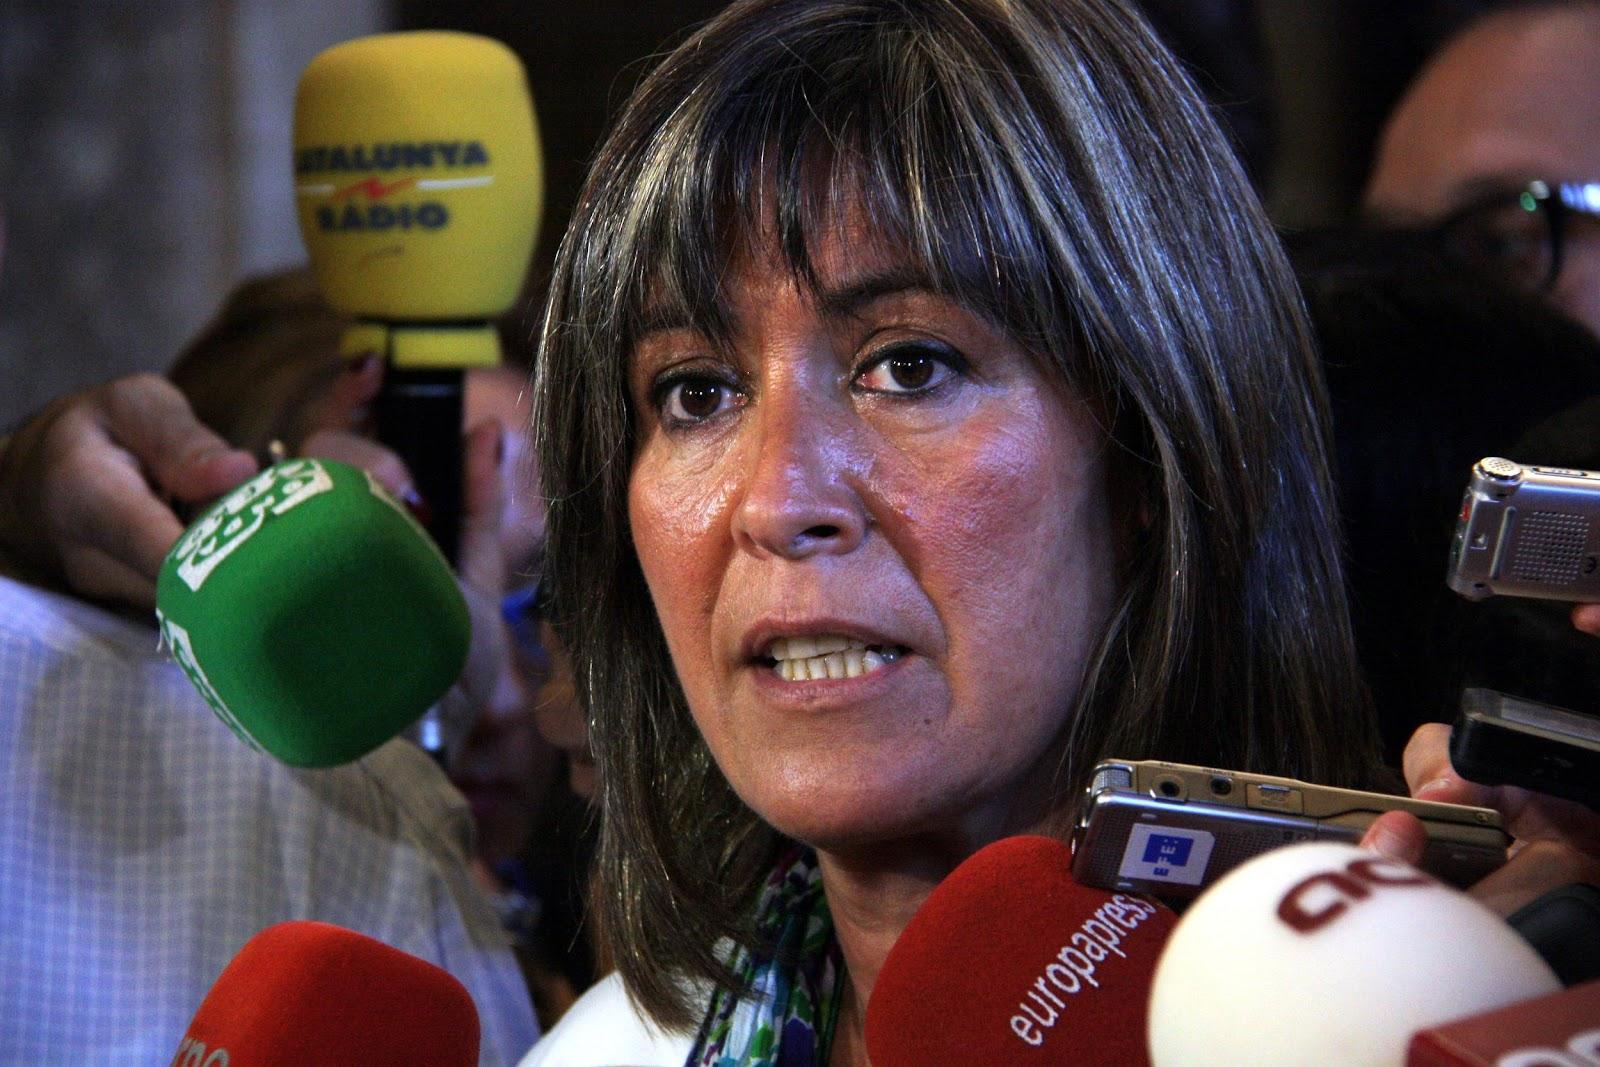 http://images.ara.cat/2014/06/12/politica/Nuria-Marin-dijous-Parlament-ACN_1155494559_5858894_2500x1667.jpg